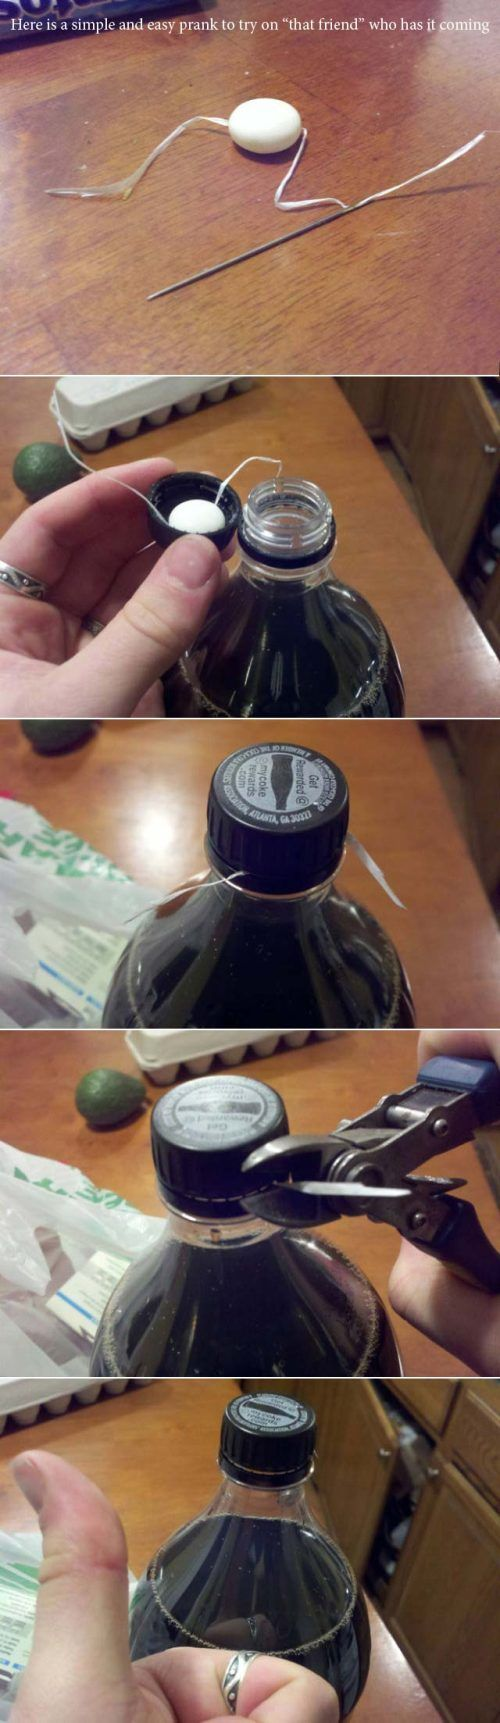 threaded mentos! haha great prank idea!!!